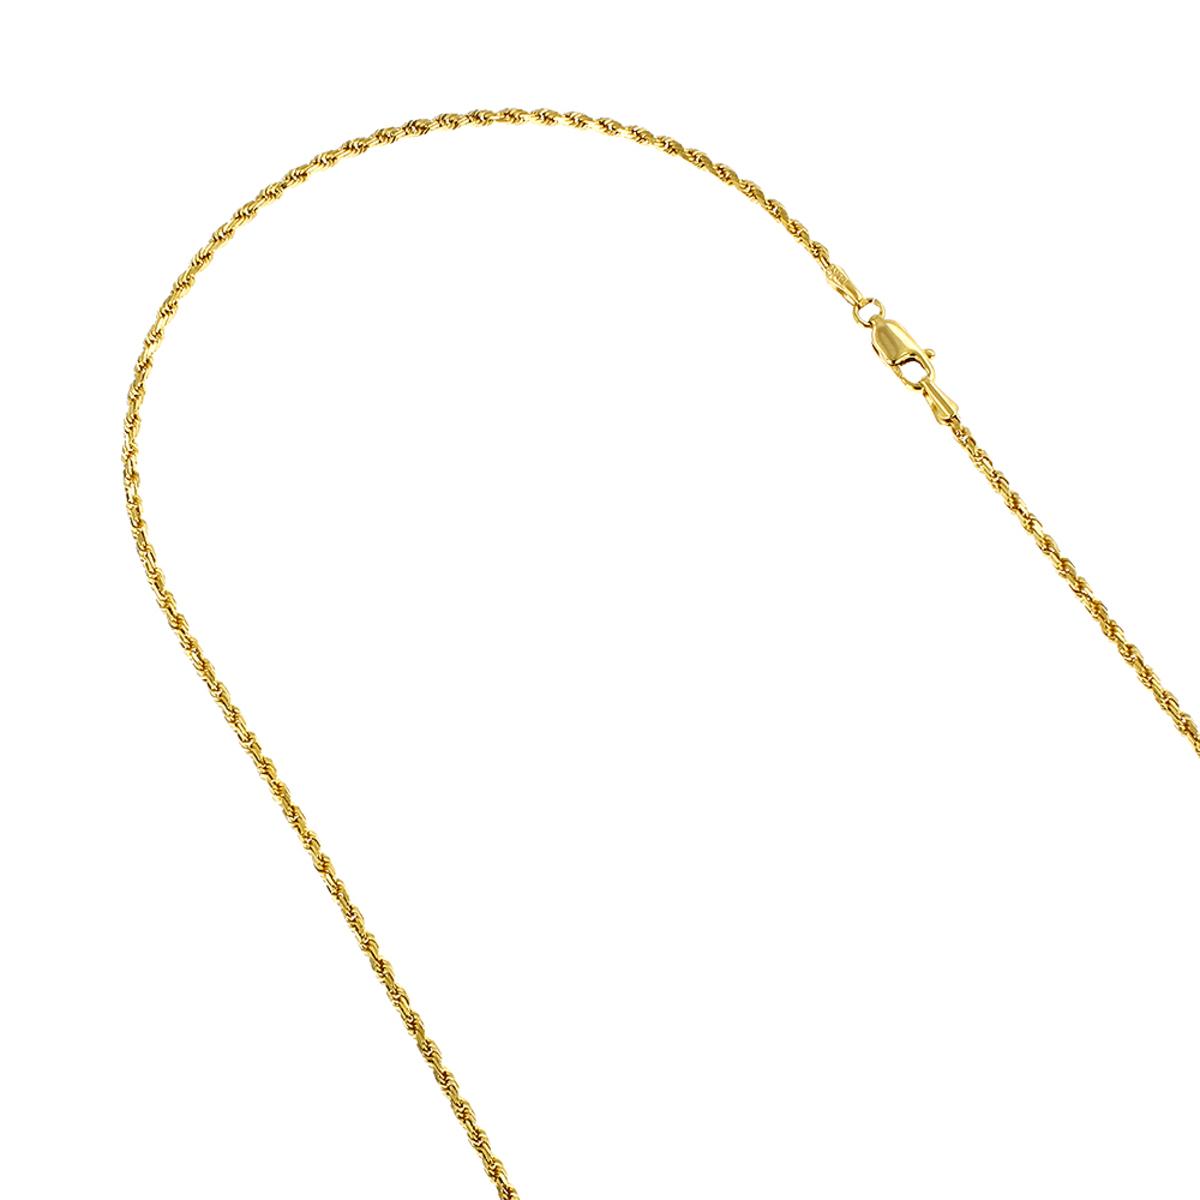 LUXURMAN Solid 14k Gold Rope Chain For Men & Women 1.3mm Wide